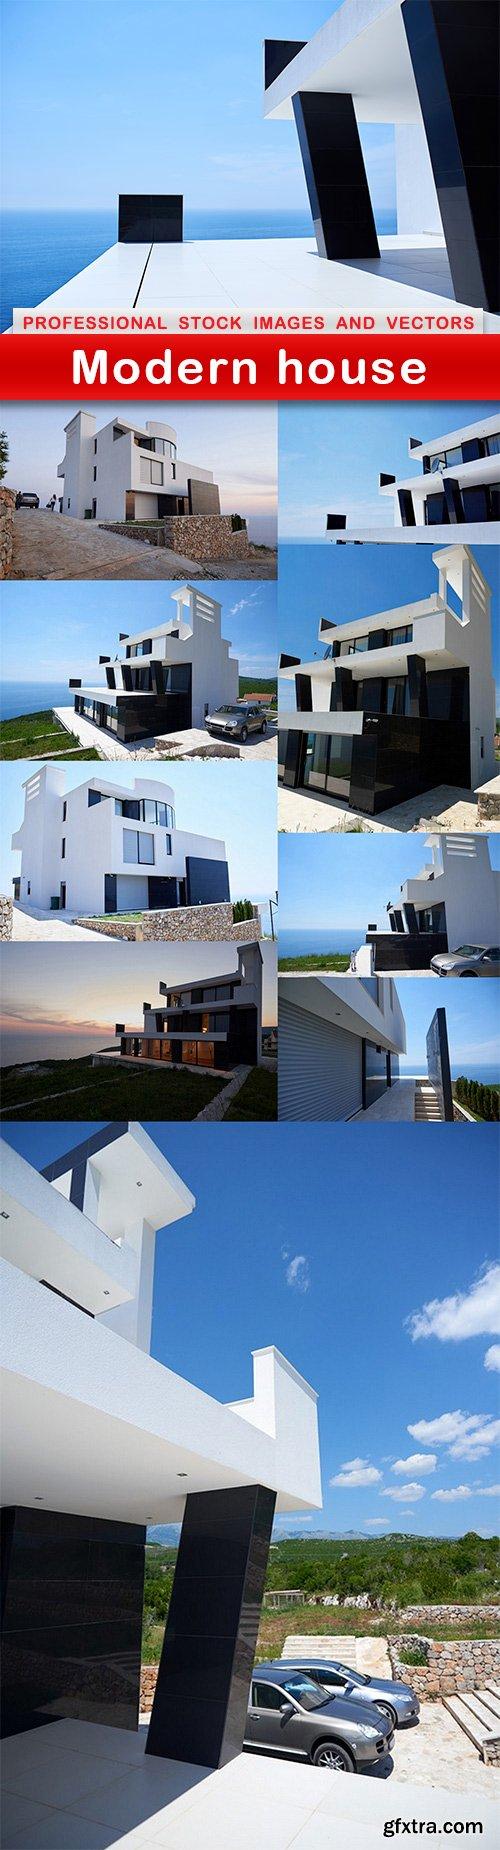 Modern house - 10 UHQ JPEG